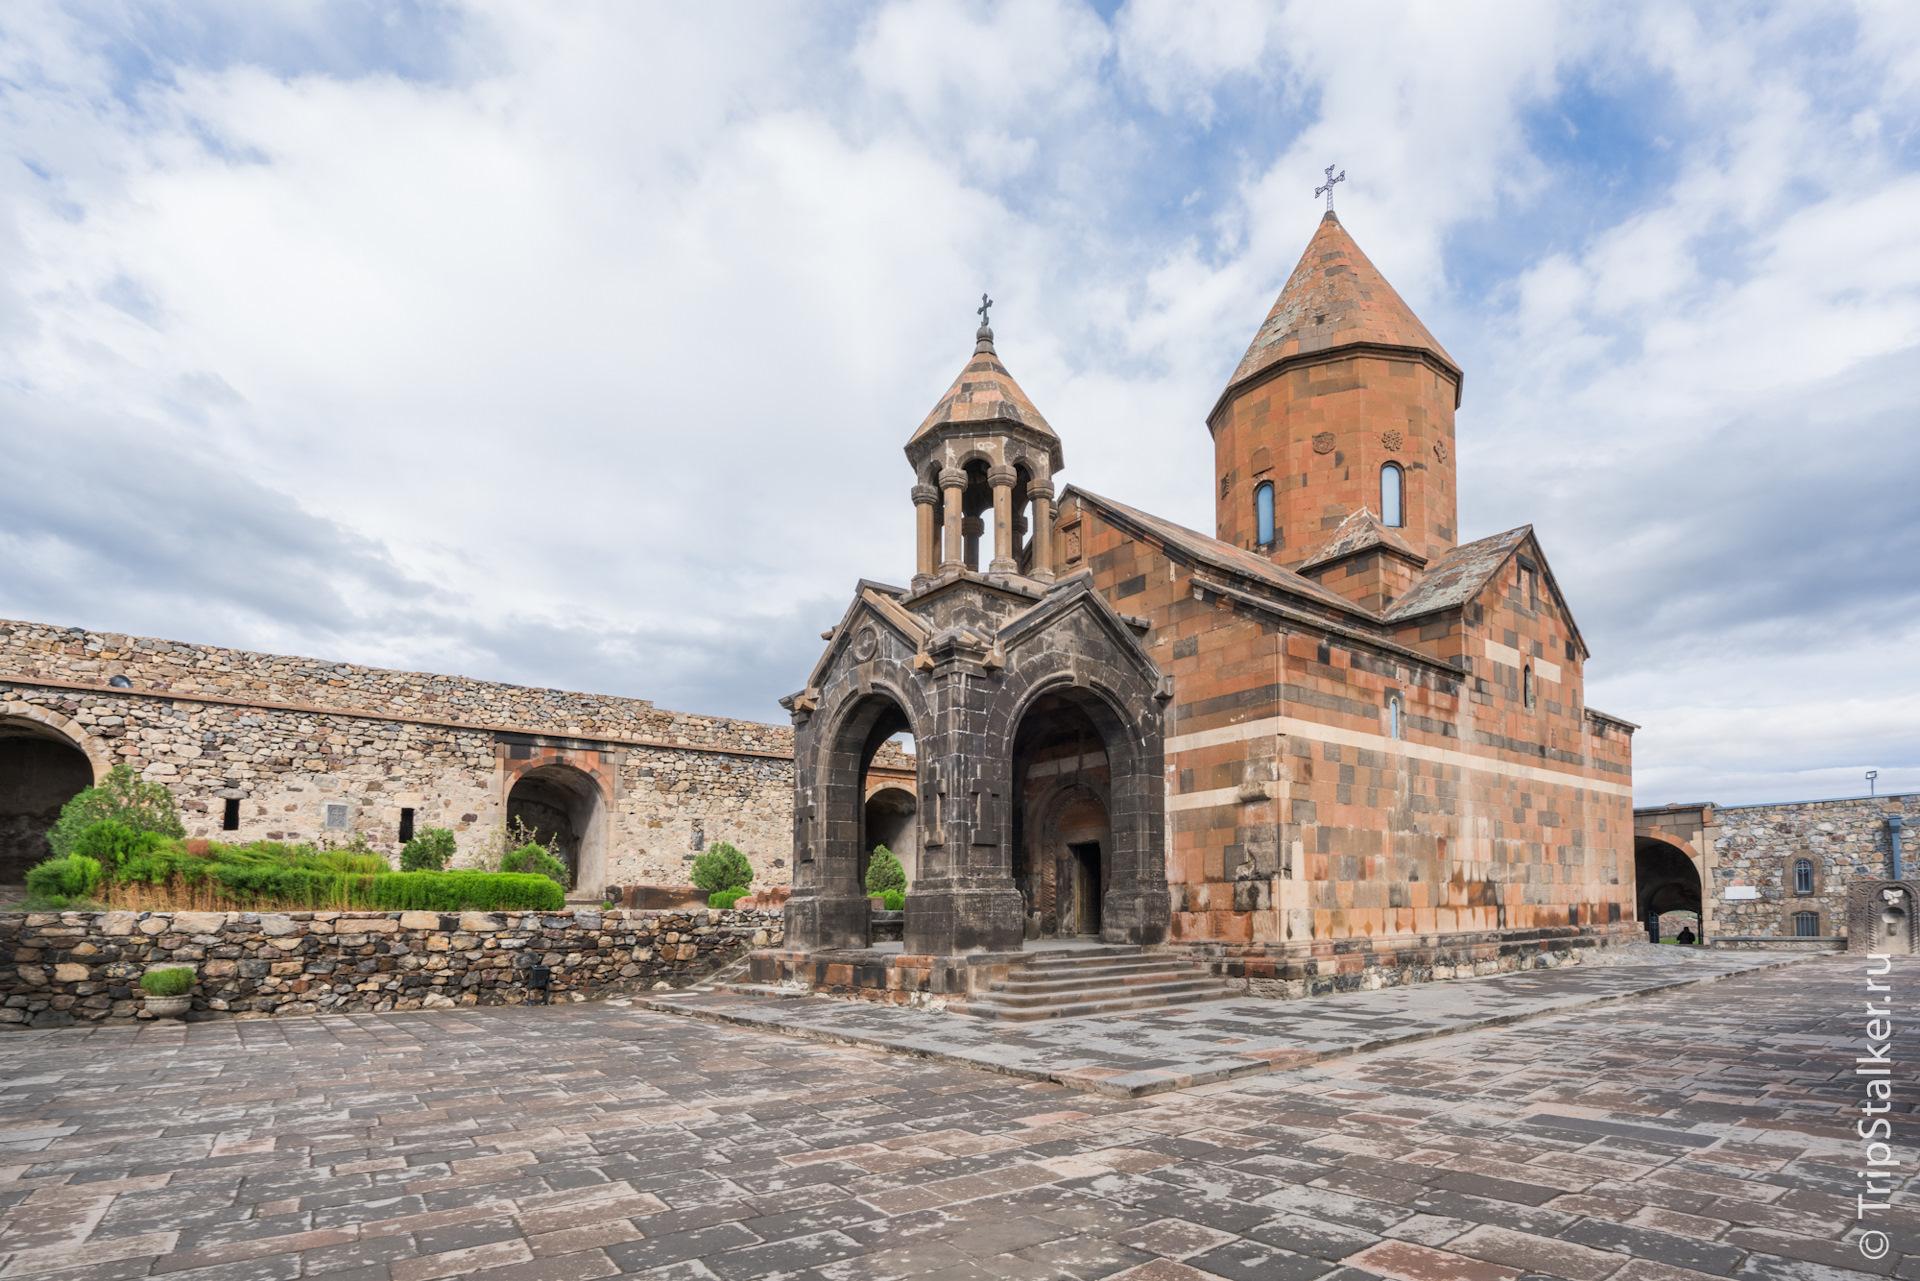 картинка охват армянский монастырь жарких странах вскоре